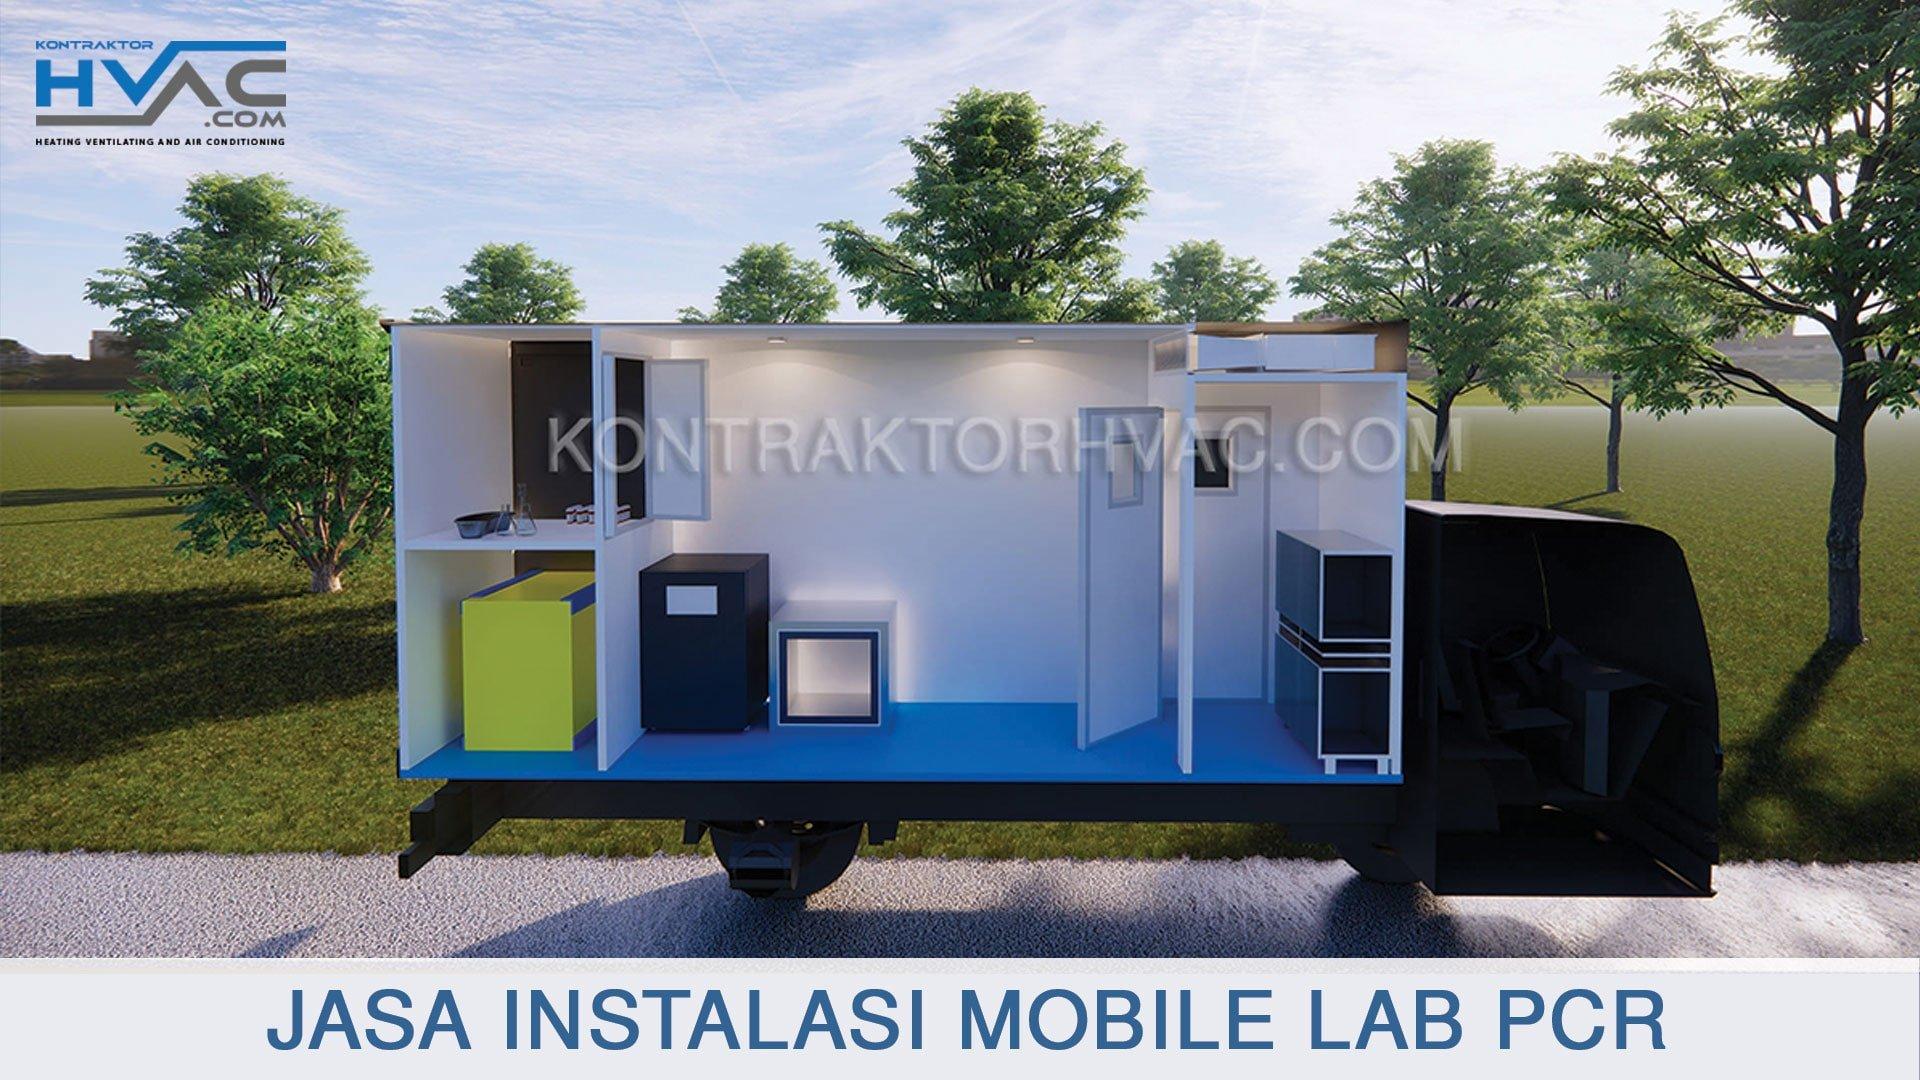 jasa-instalasi-mobile-lab-pcr-min